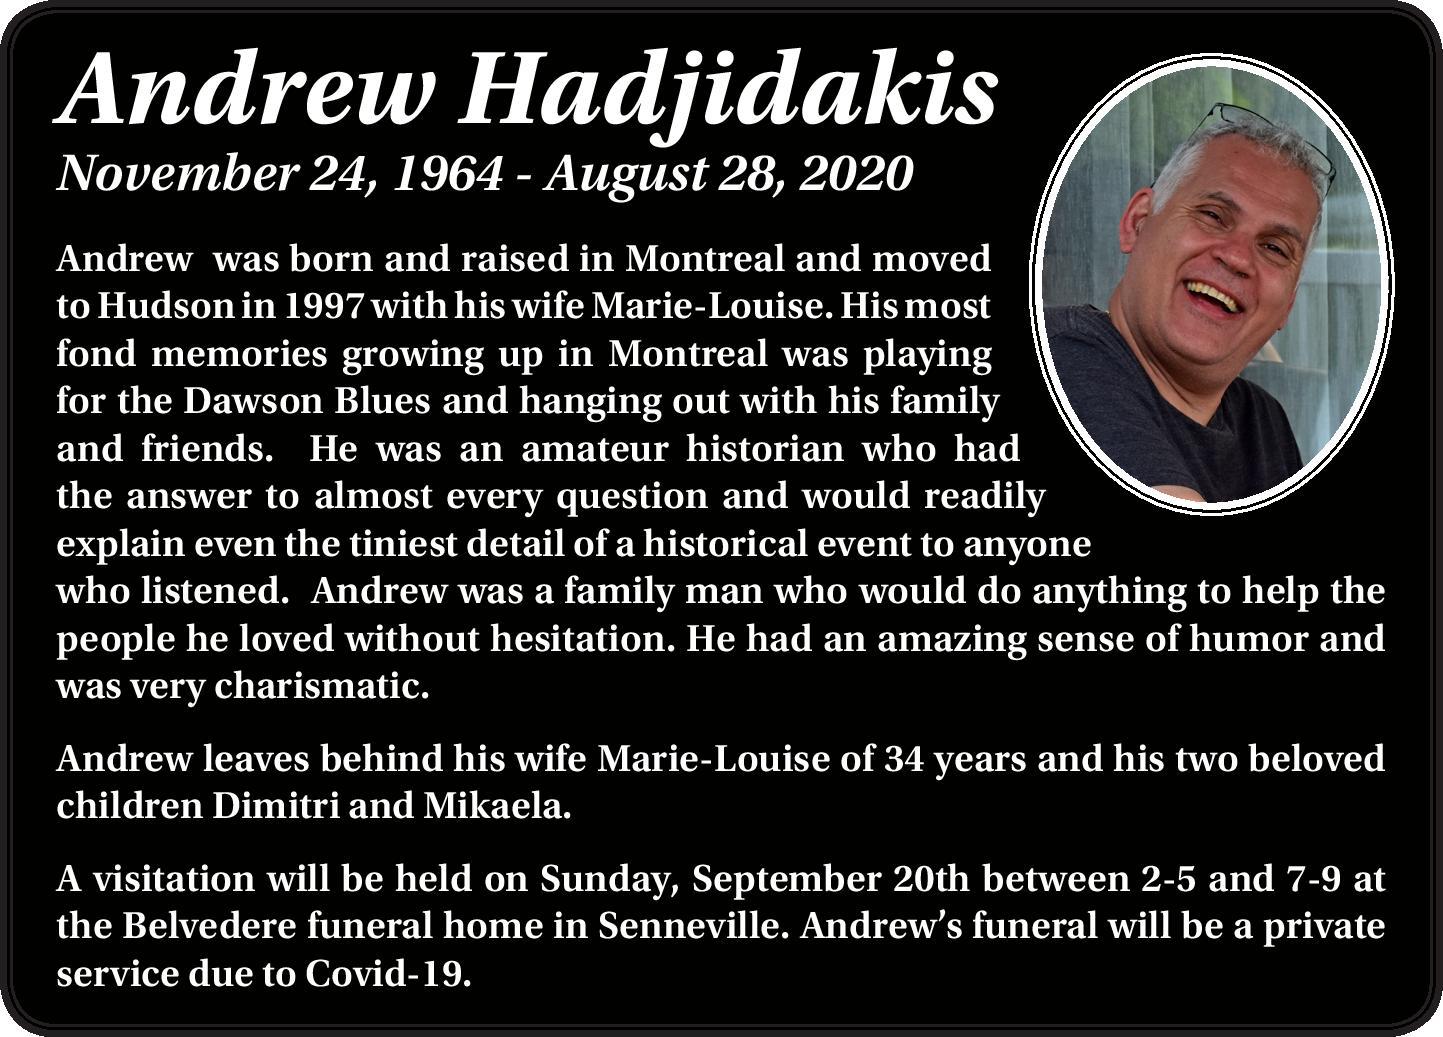 Andrew Hadjidakis